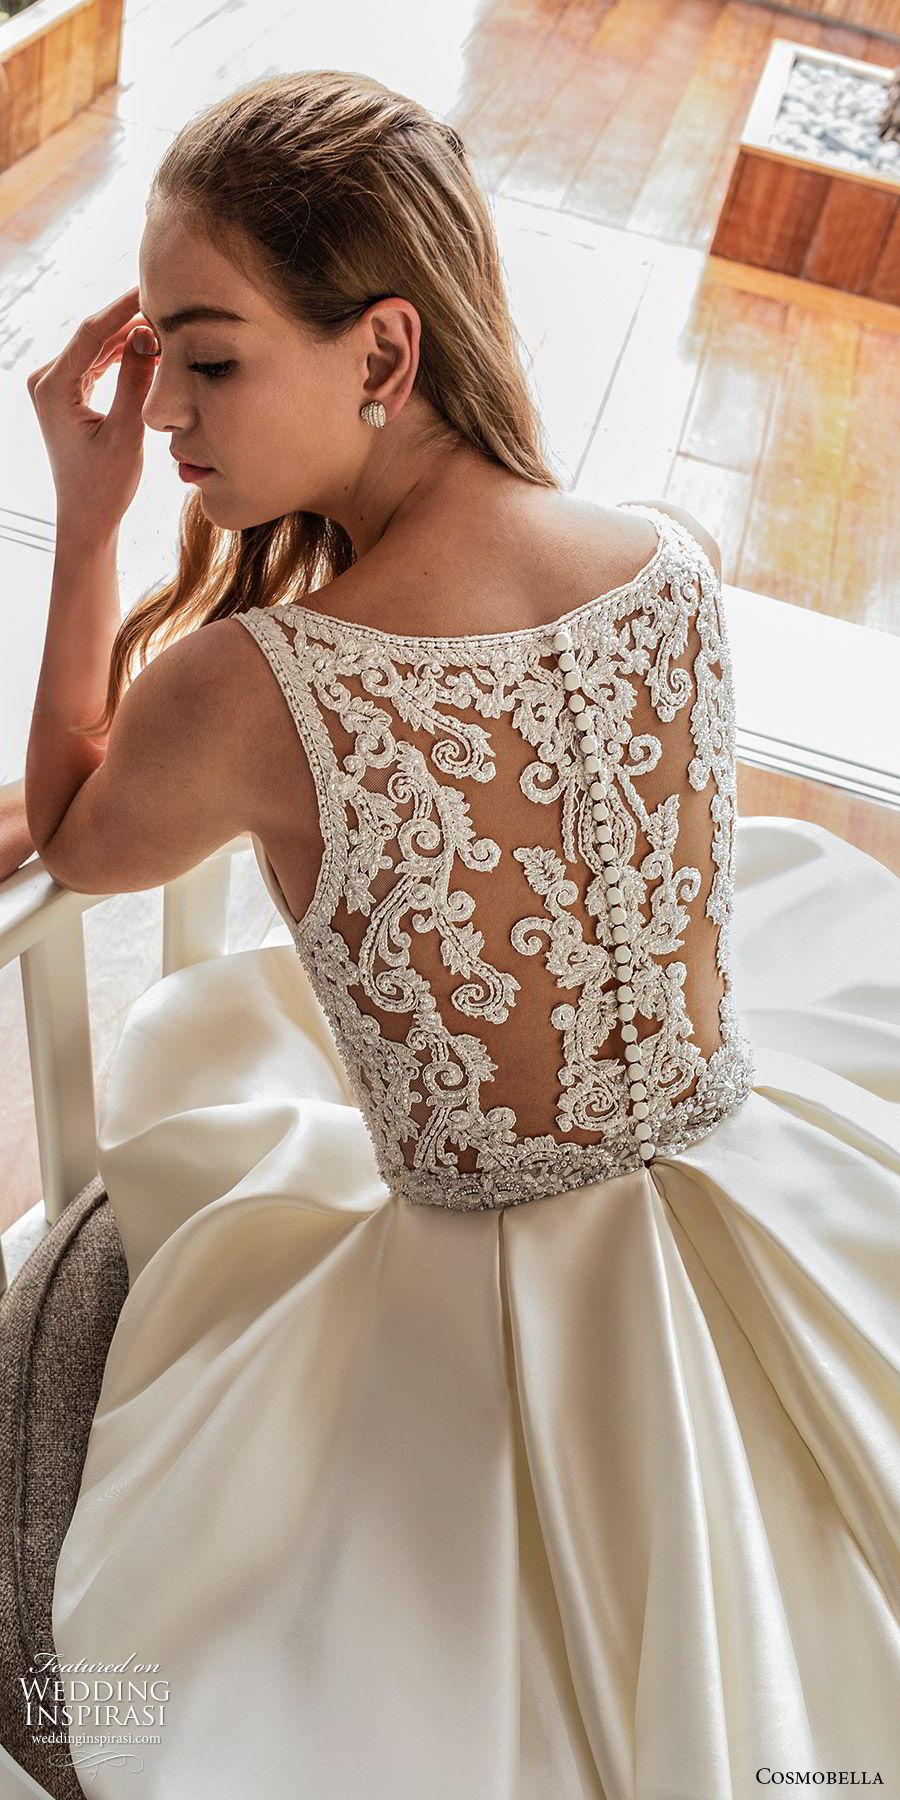 cosmobella 2020 bridal sleeveless thick straps deep v neckline split sweetheart a line ball gown wedding dress (17) princess romantic sheer lace back chapel train zbv